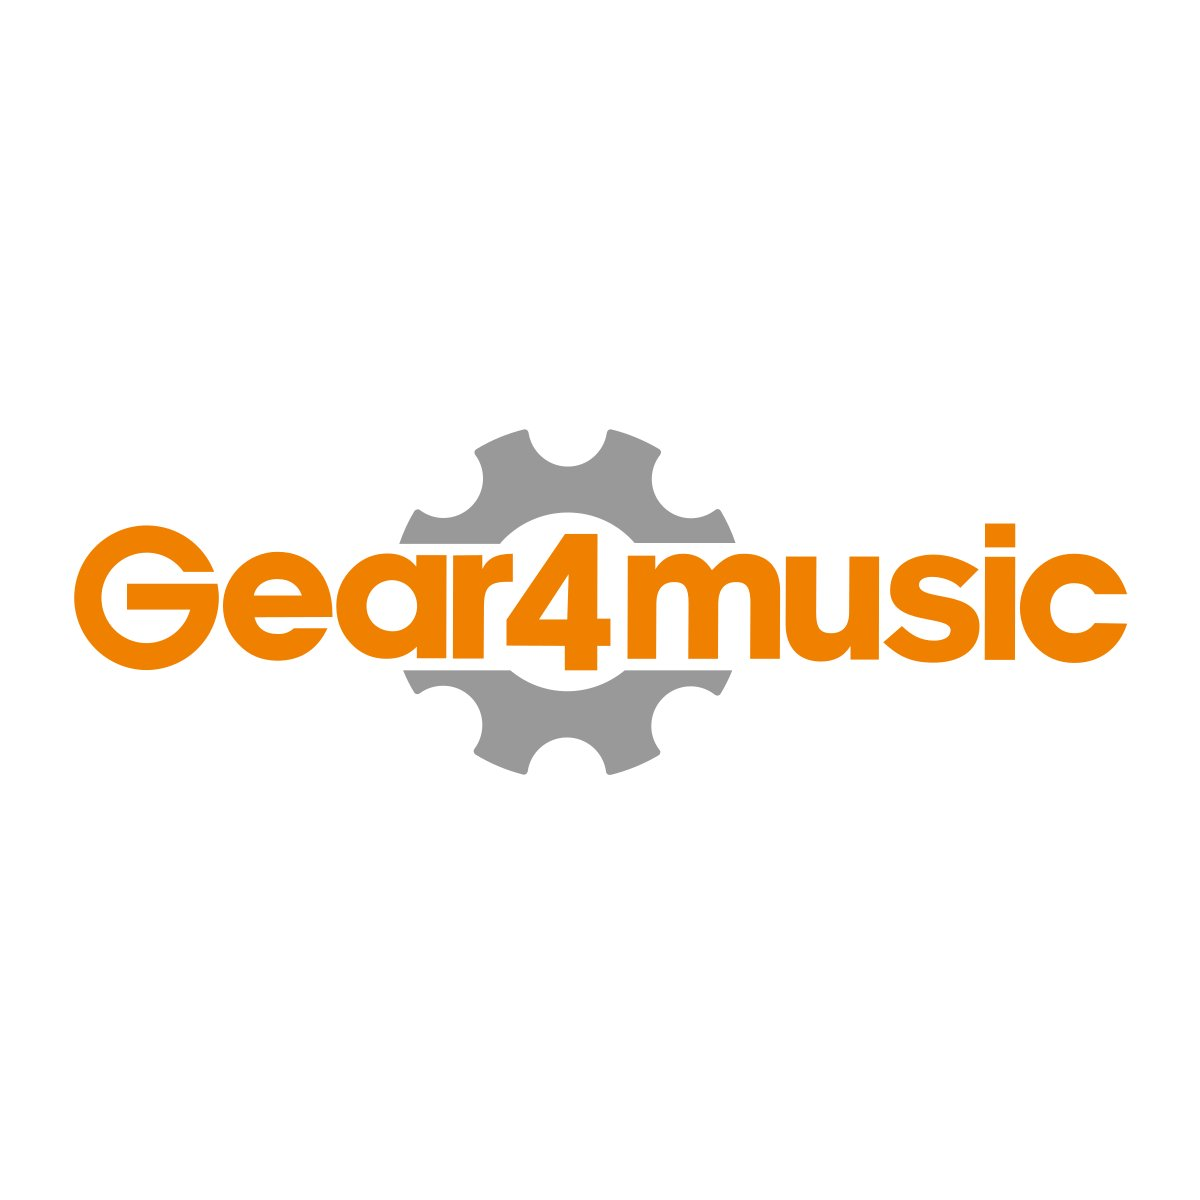 chicago bass guitar 15w amp pack sunburst at gear4music. Black Bedroom Furniture Sets. Home Design Ideas